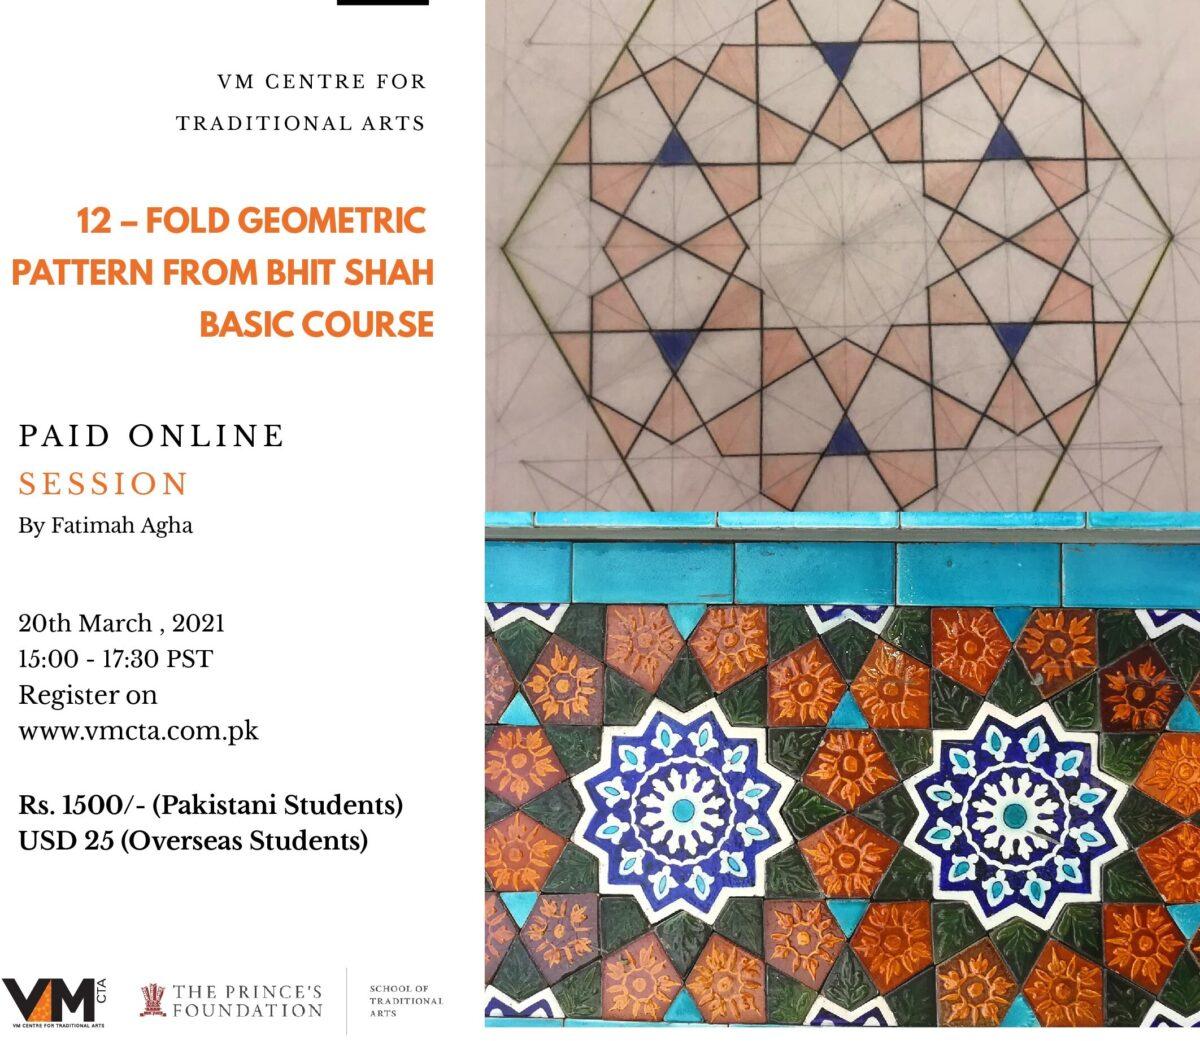 12 Fold Geometric Pattern from Bhit Shah